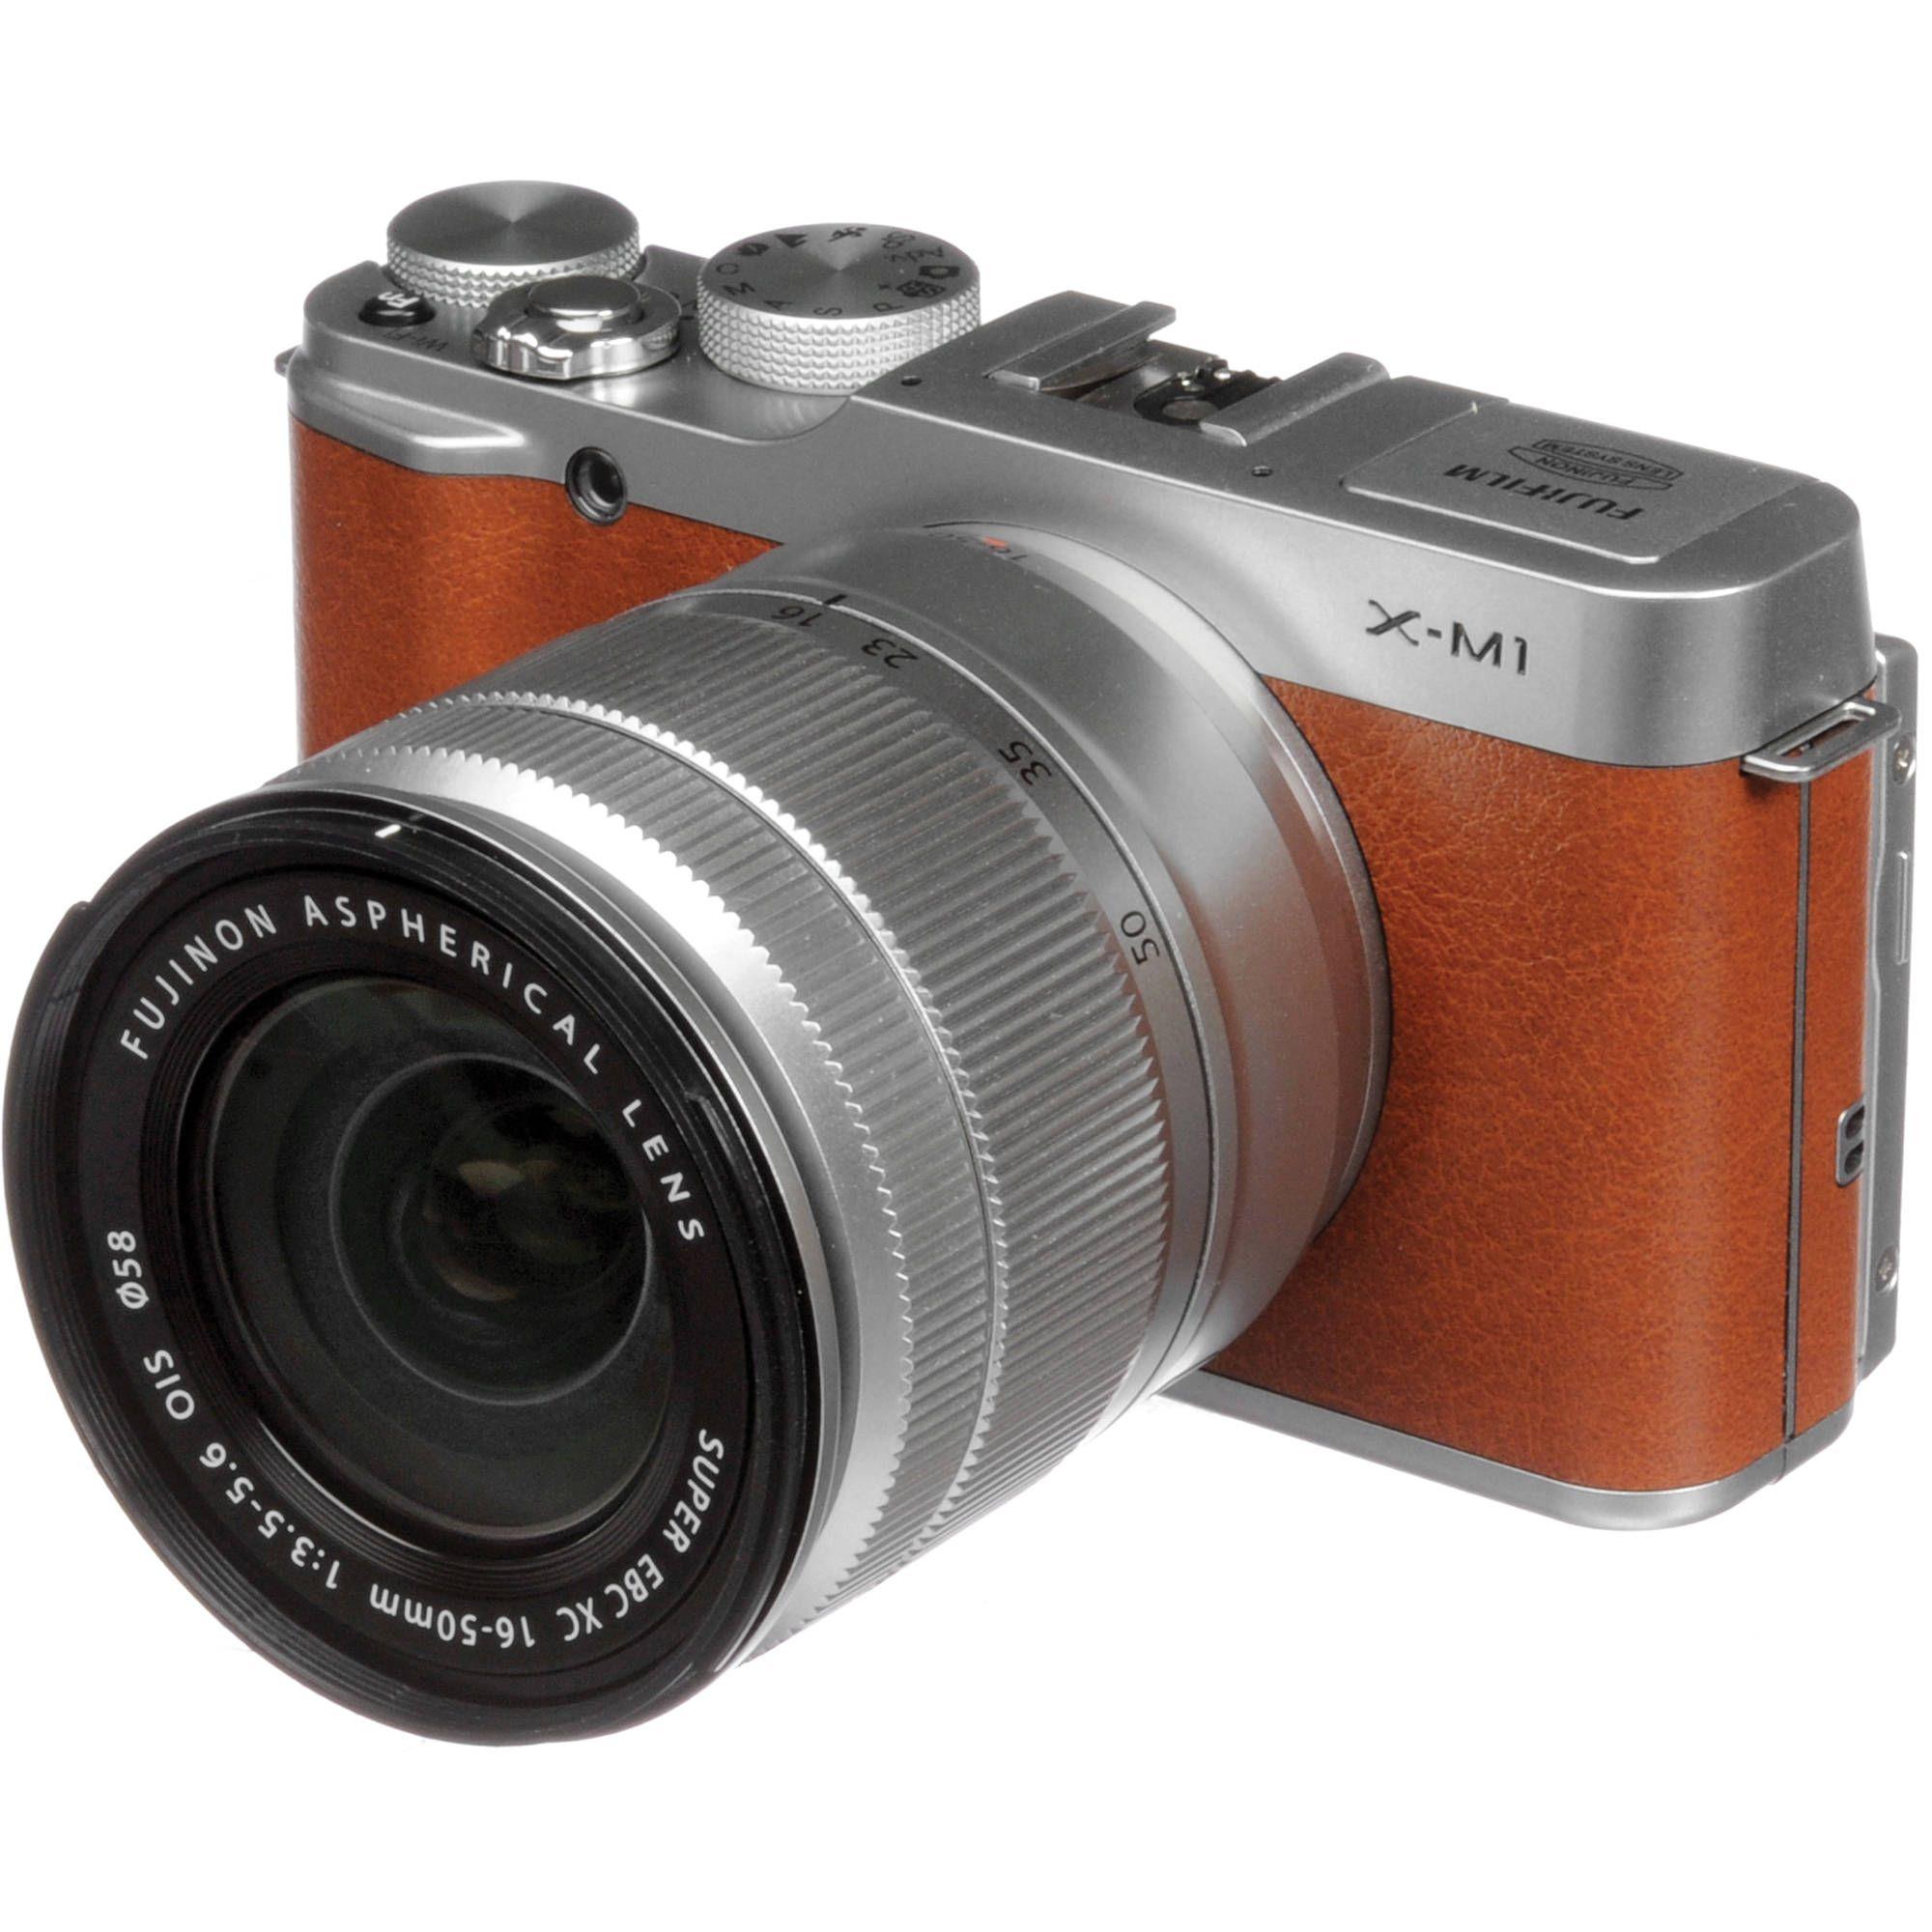 Fujifilm X M1 Mirrorless Digital Camera With 16 50mm Lens Brown Digital Camera Digital Mirrorless Camera